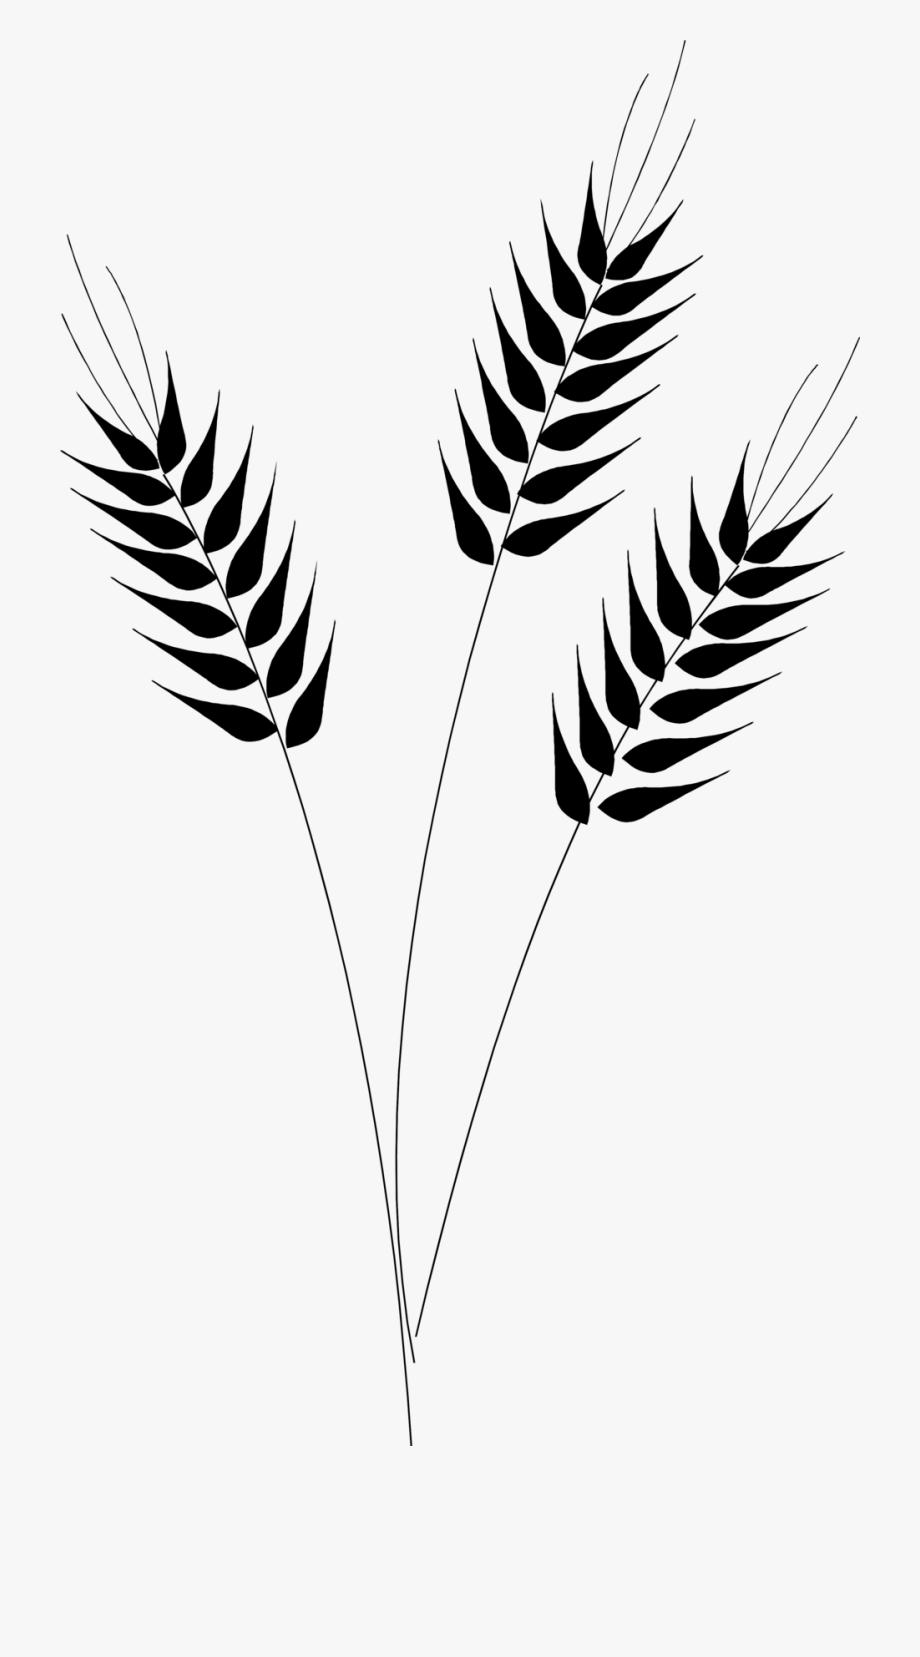 Harvest Clipart Wheat Harvest.